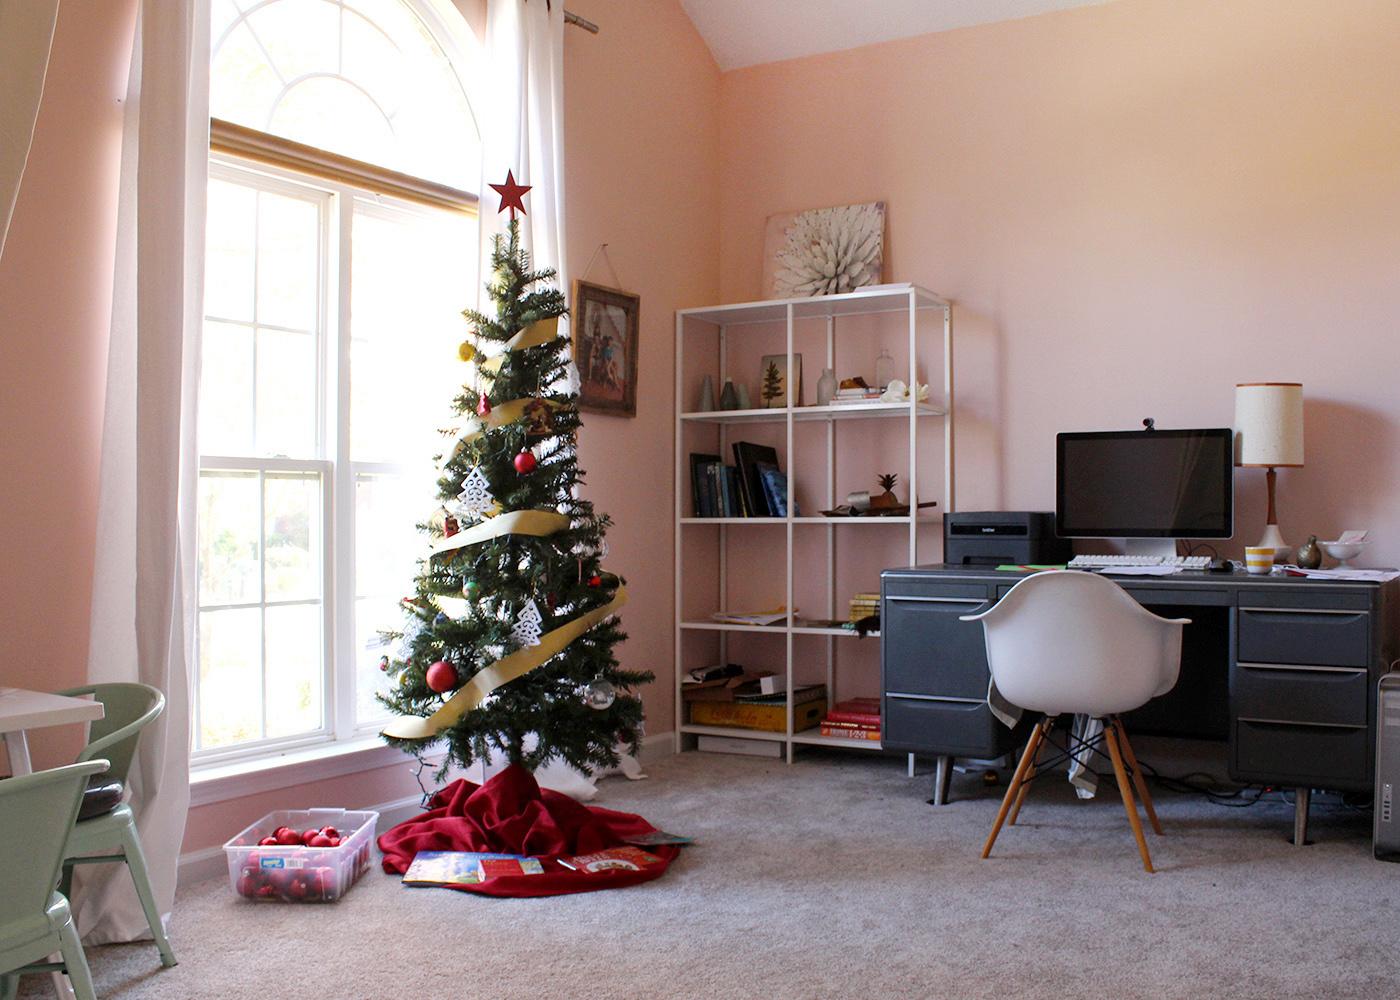 fun idea for a kids tree! modern Christmas home tour